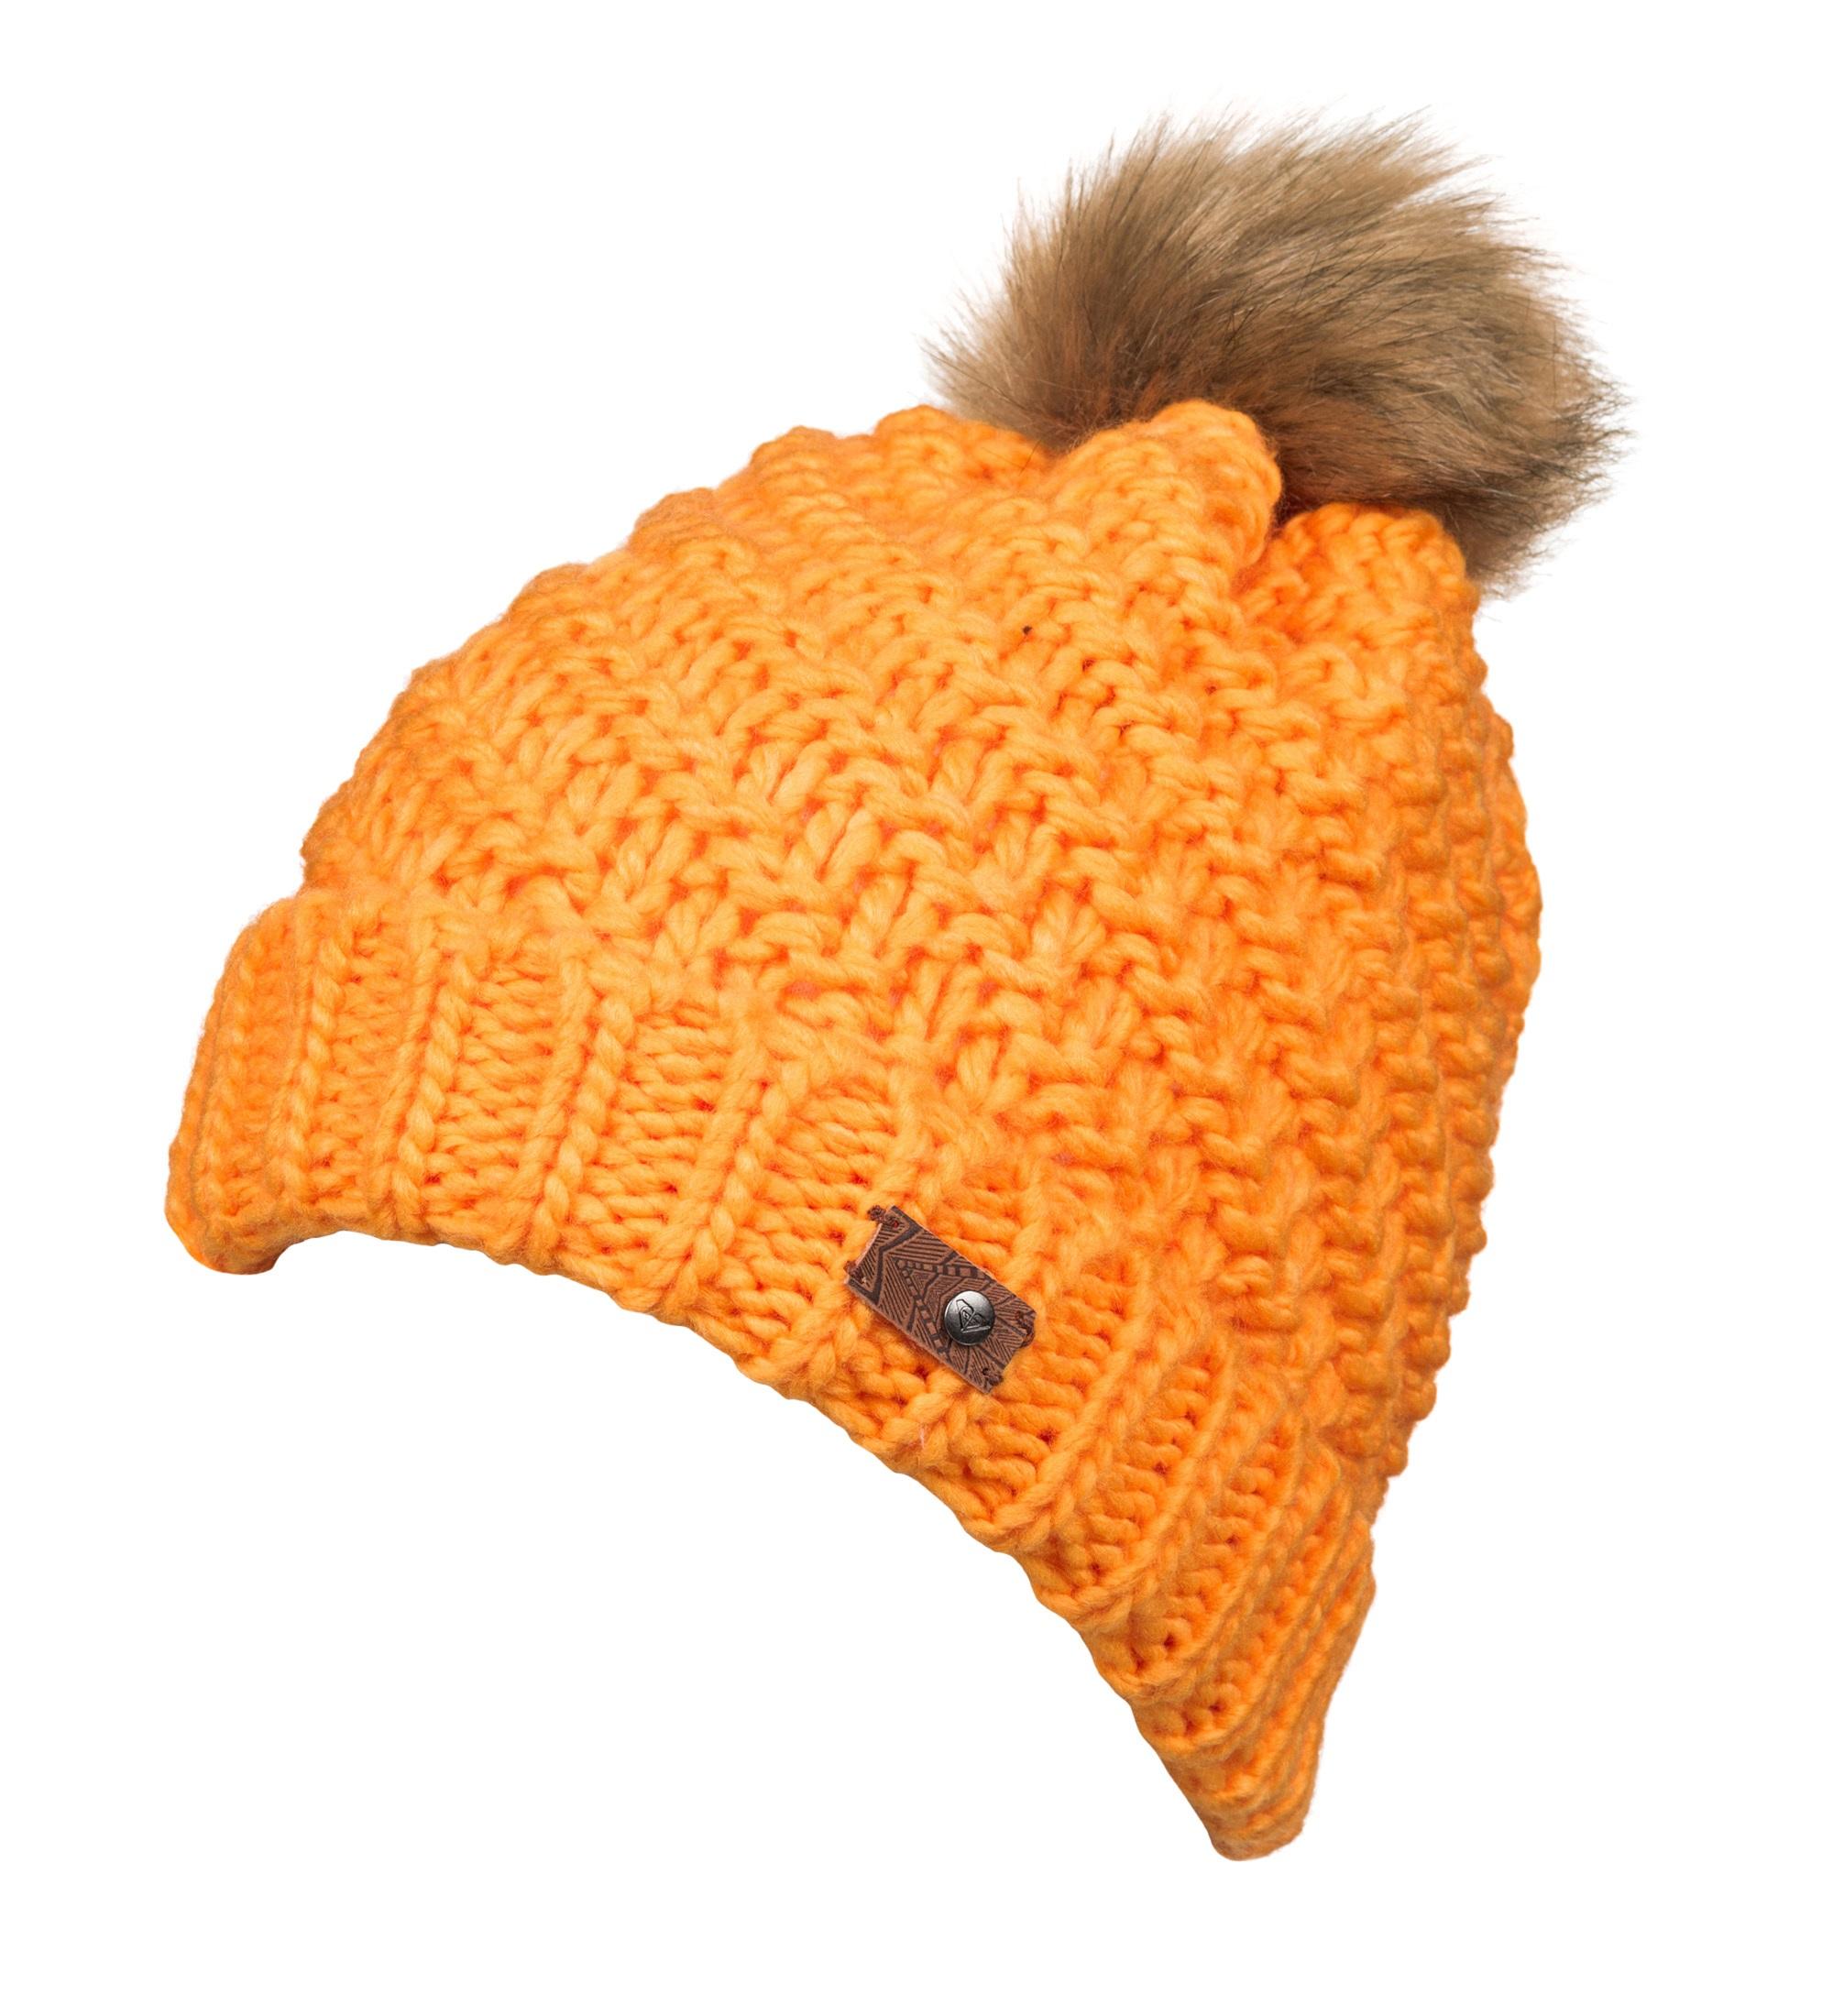 16fb8cbbbafc8 Roxy Women s Blizzard Bobble Beanie Hat